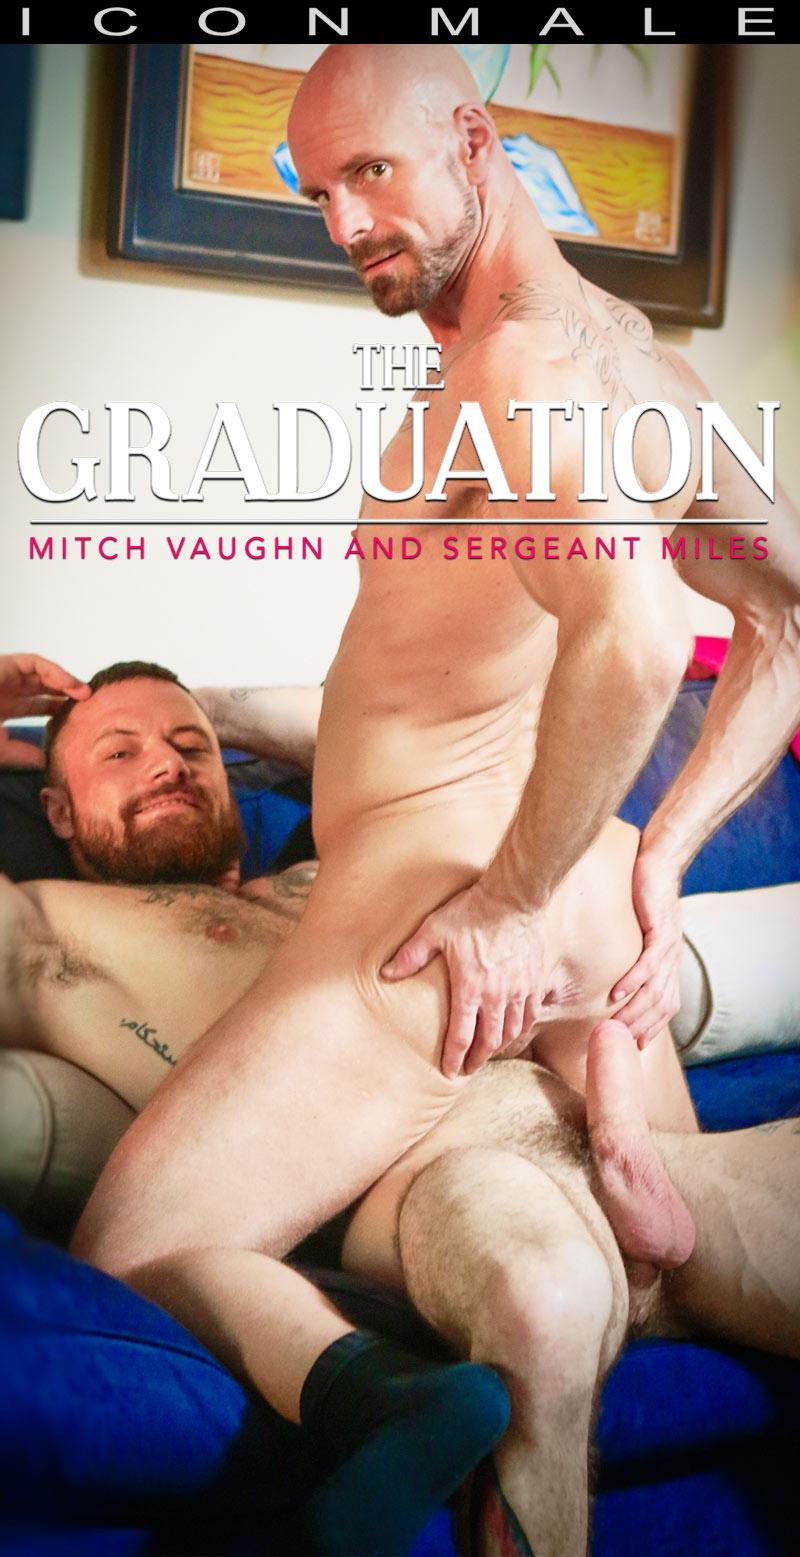 The Graduation (Sergeant Miles Fucks Mitch Vaughn) (Scene 2) at Icon Male